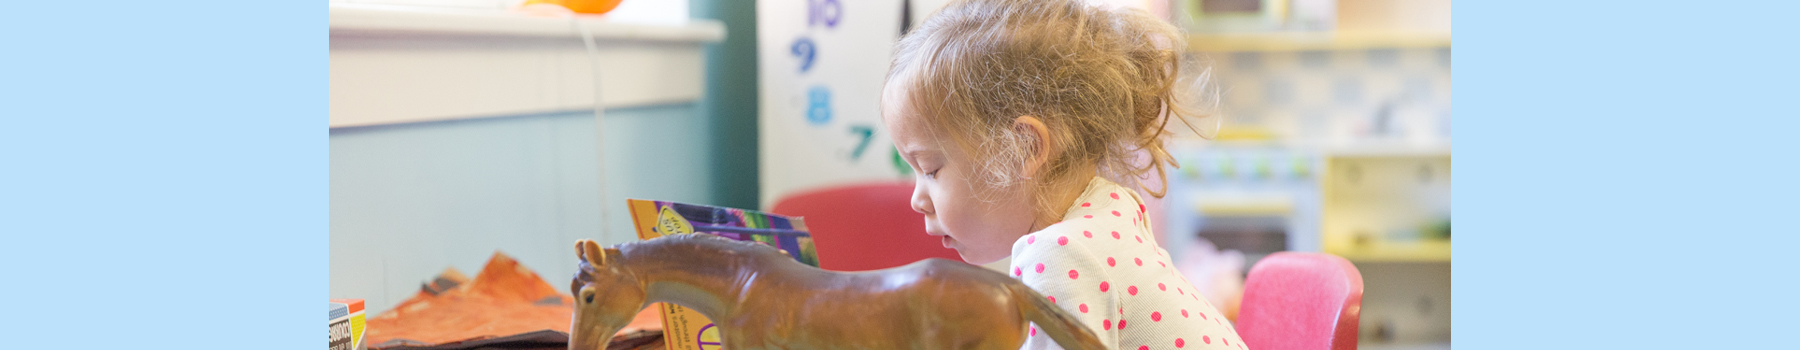 preschool-home-slider-oct2018-5